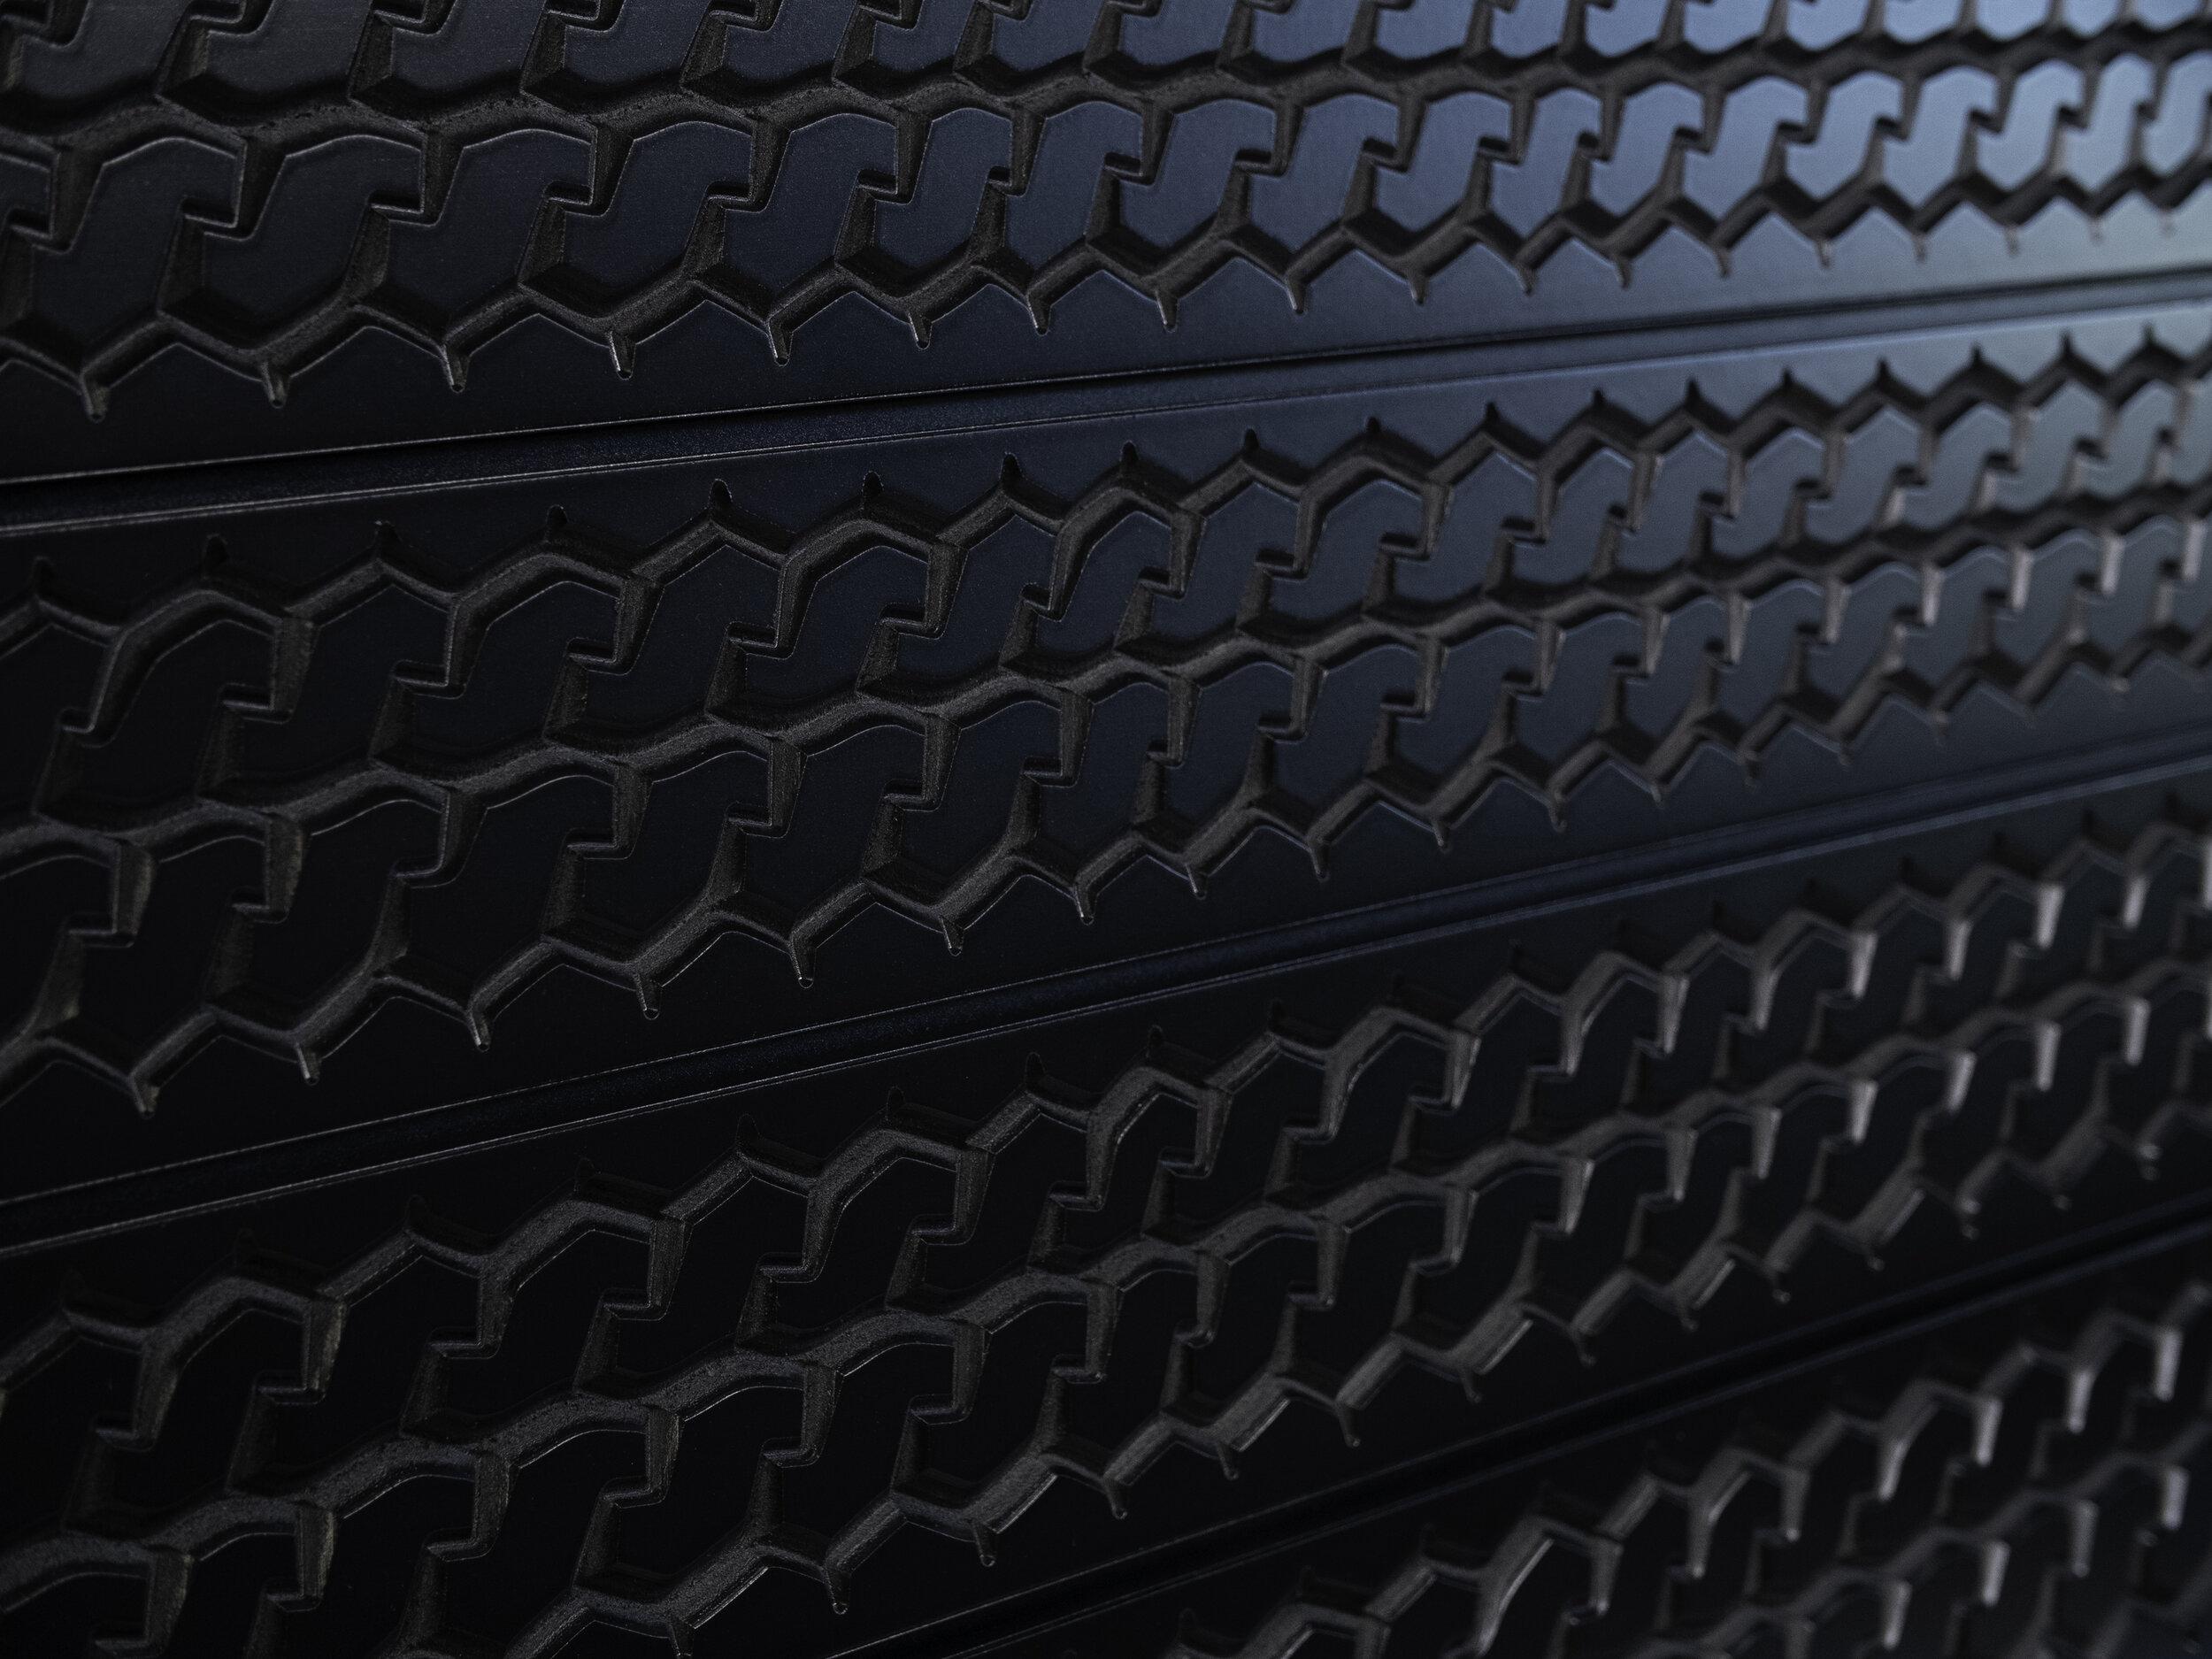 STX tire tread black angle shot.jpg